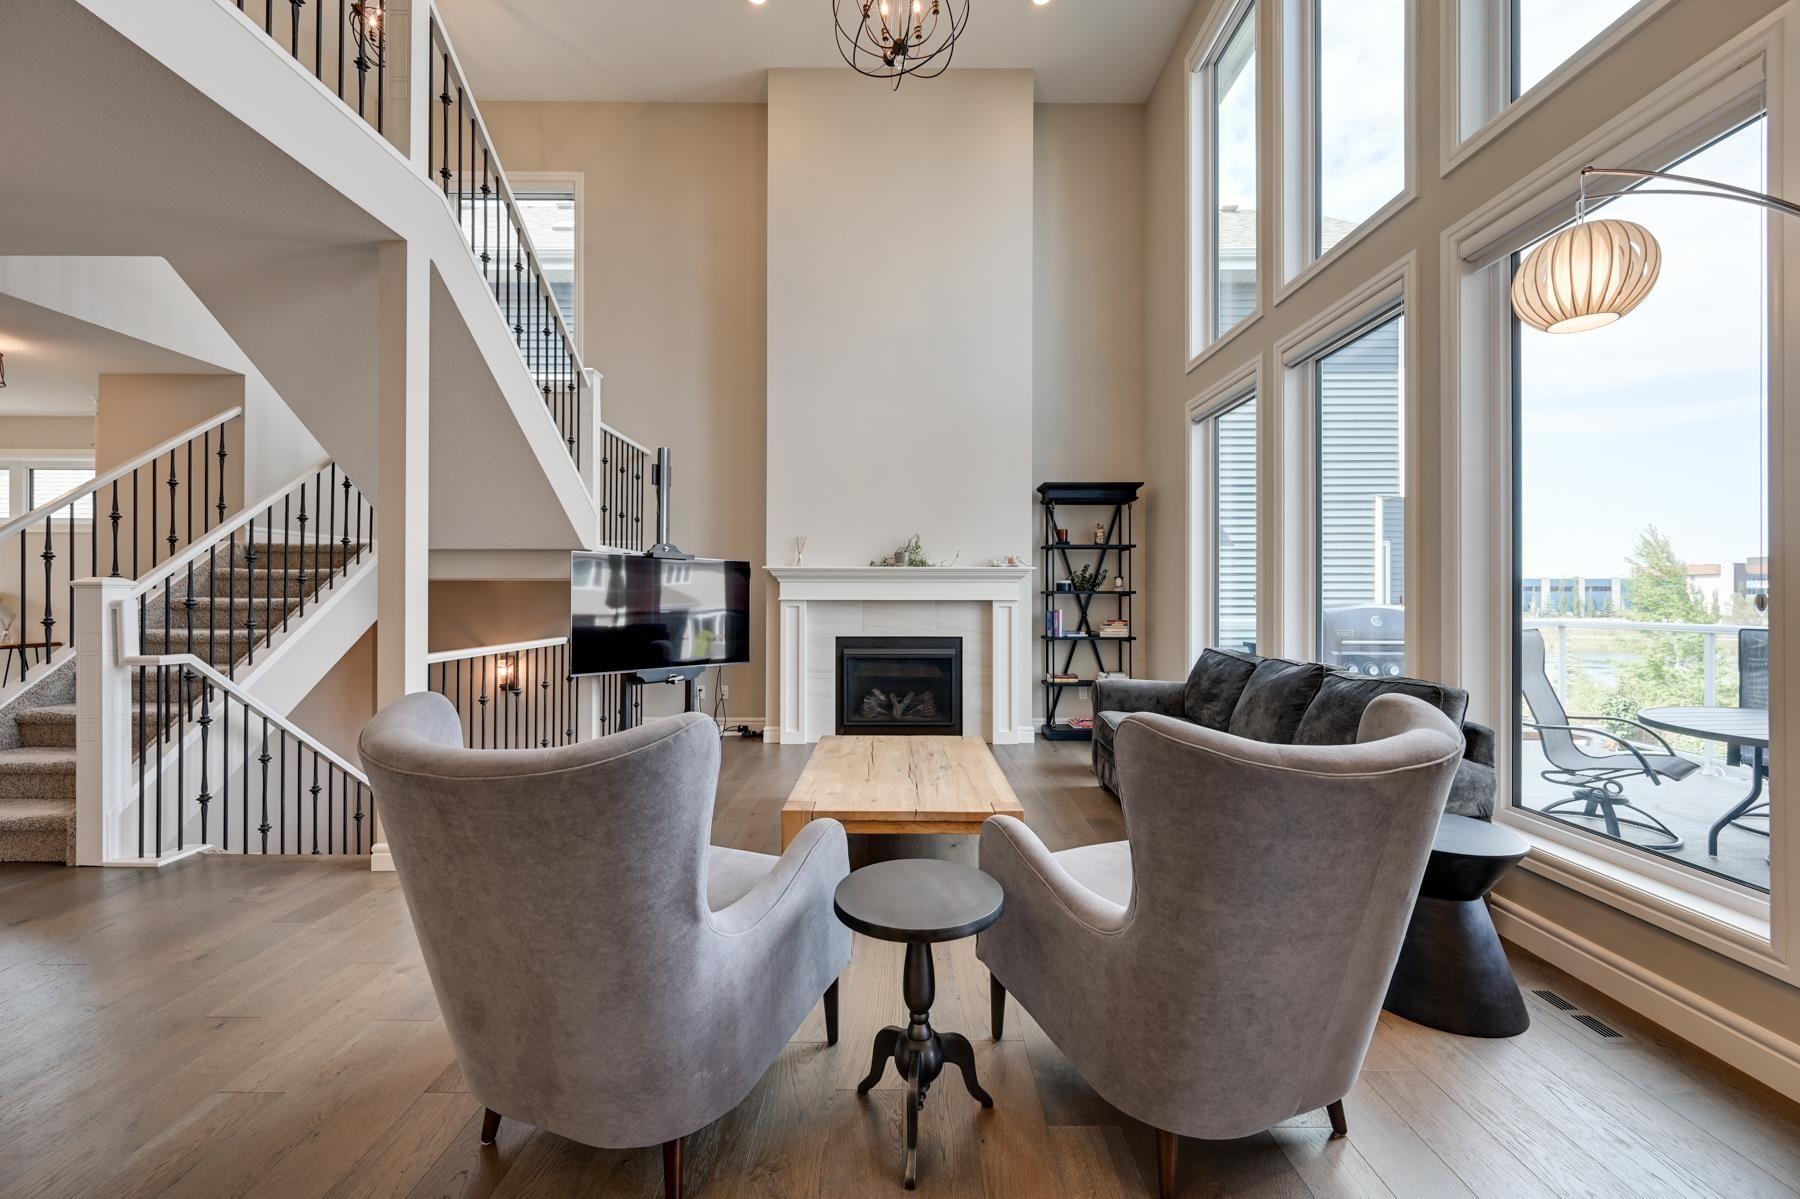 Main Photo: 9034 24 Avenue in Edmonton: Zone 53 House for sale : MLS®# E4262684